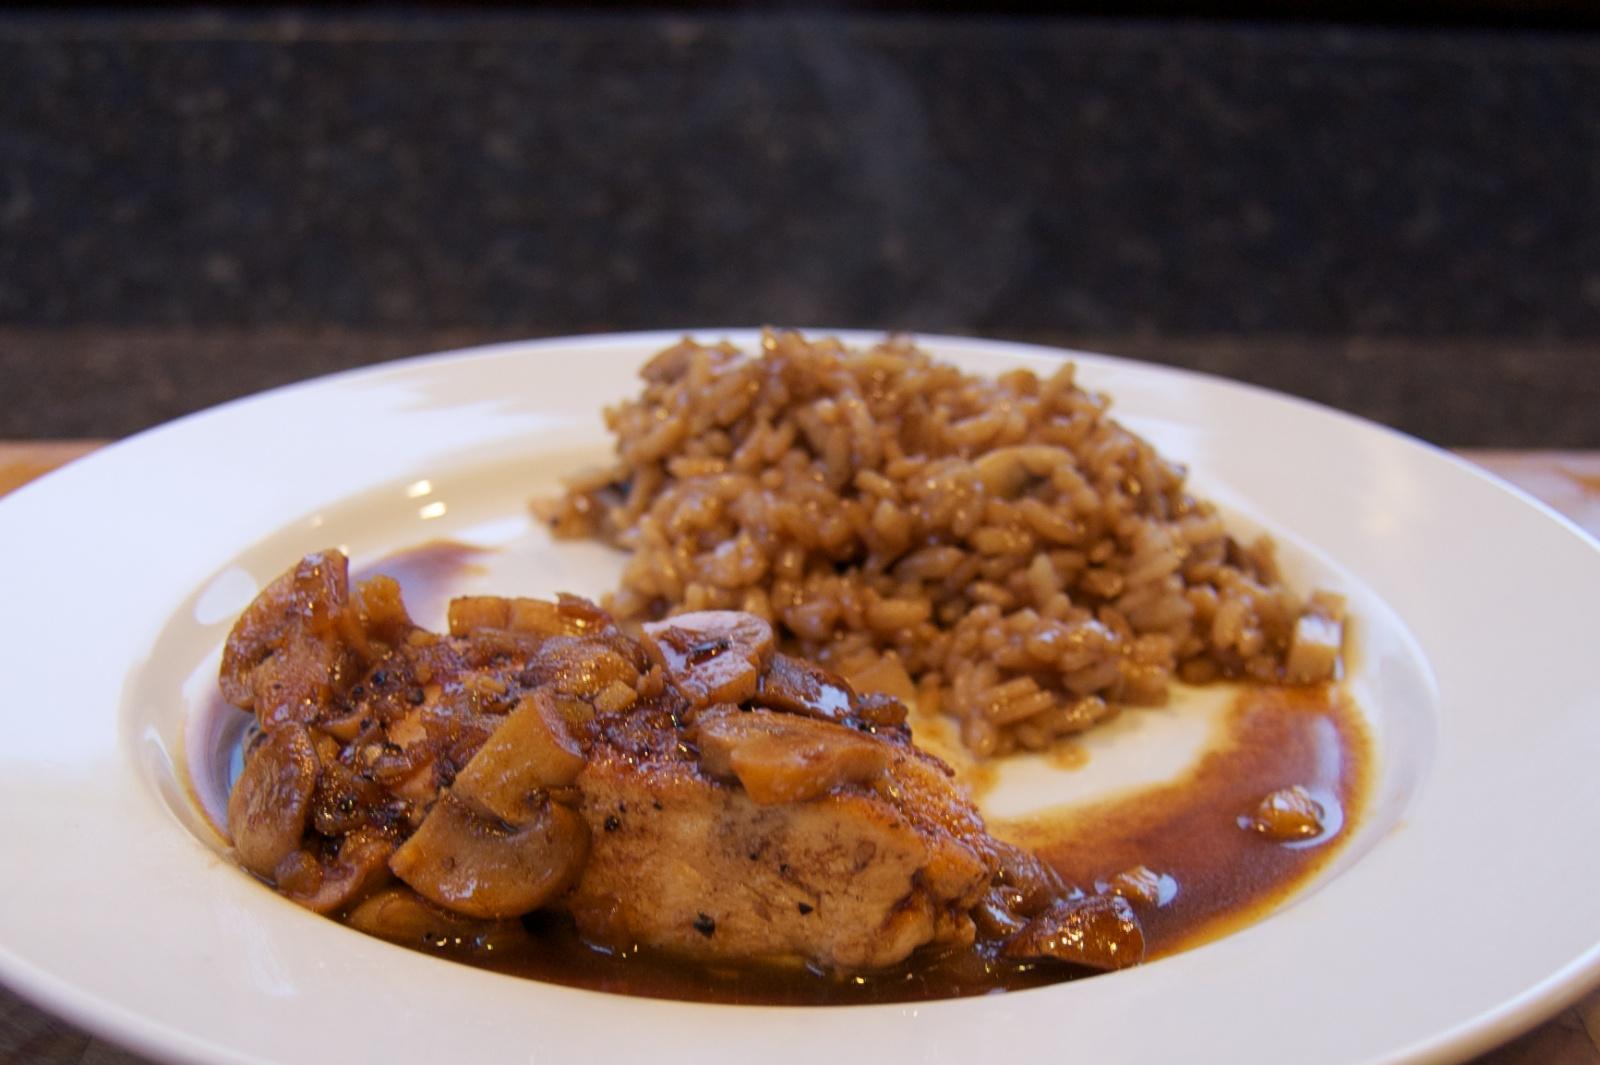 http://blog.rickk.com/food/2012/10/10/ate.2012.10.11.d.jpg